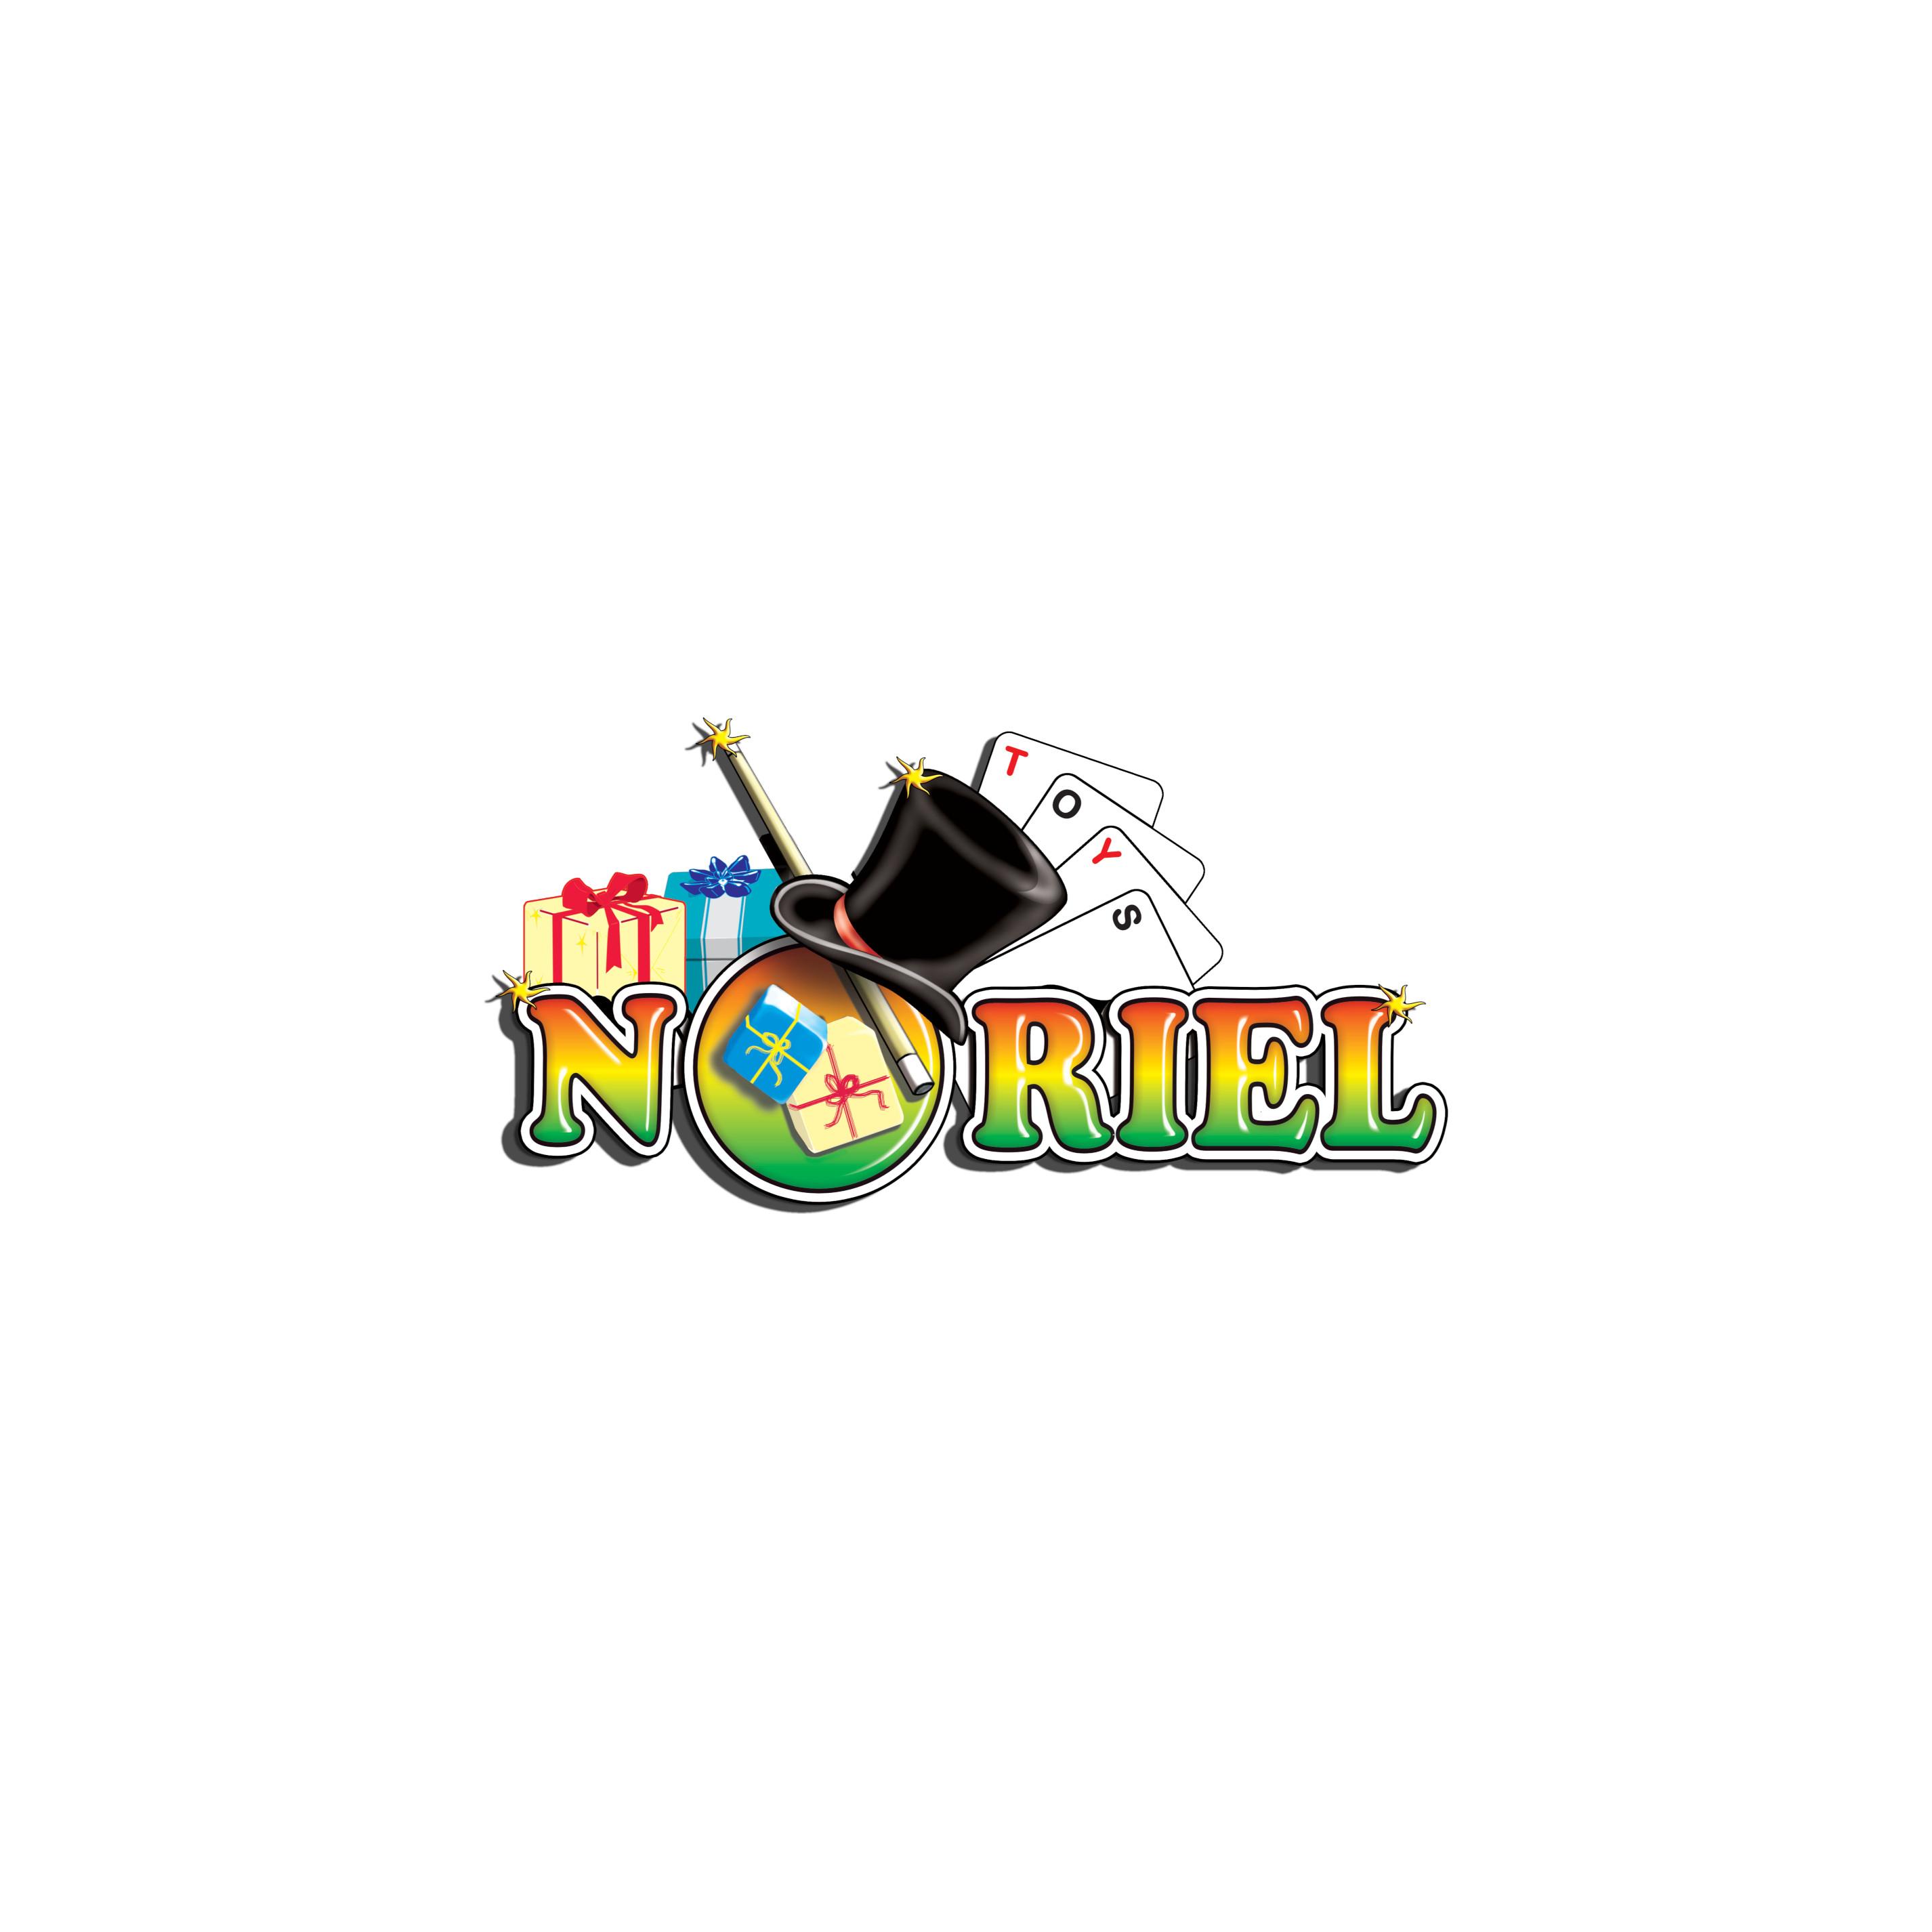 NOR3220_001w Joc de societate Noriel Games, Familia la ferma